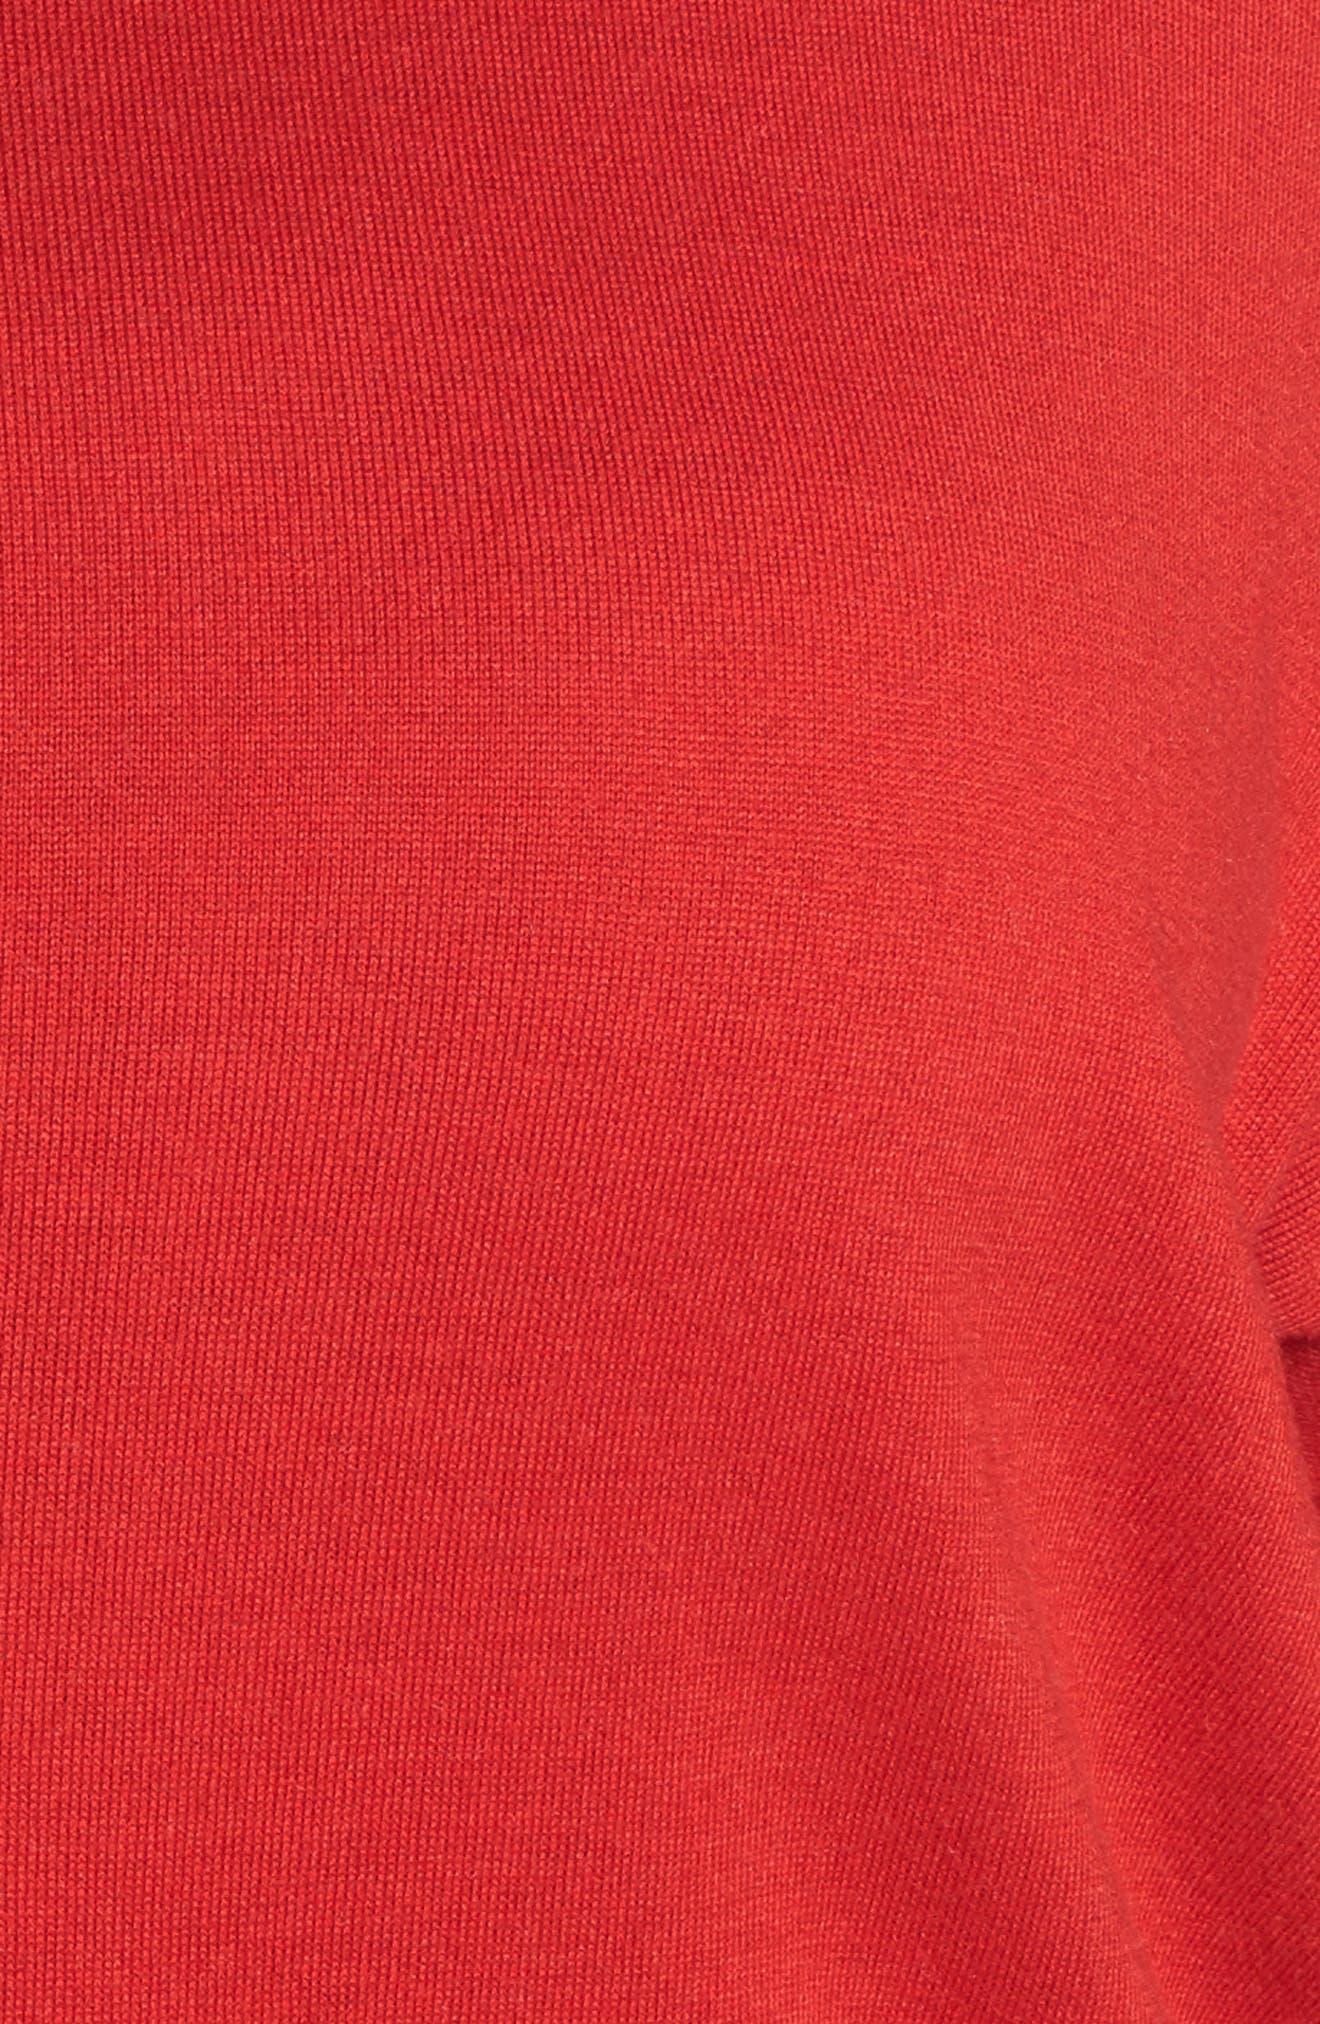 Dolman Sleeve Sweater,                             Alternate thumbnail 15, color,